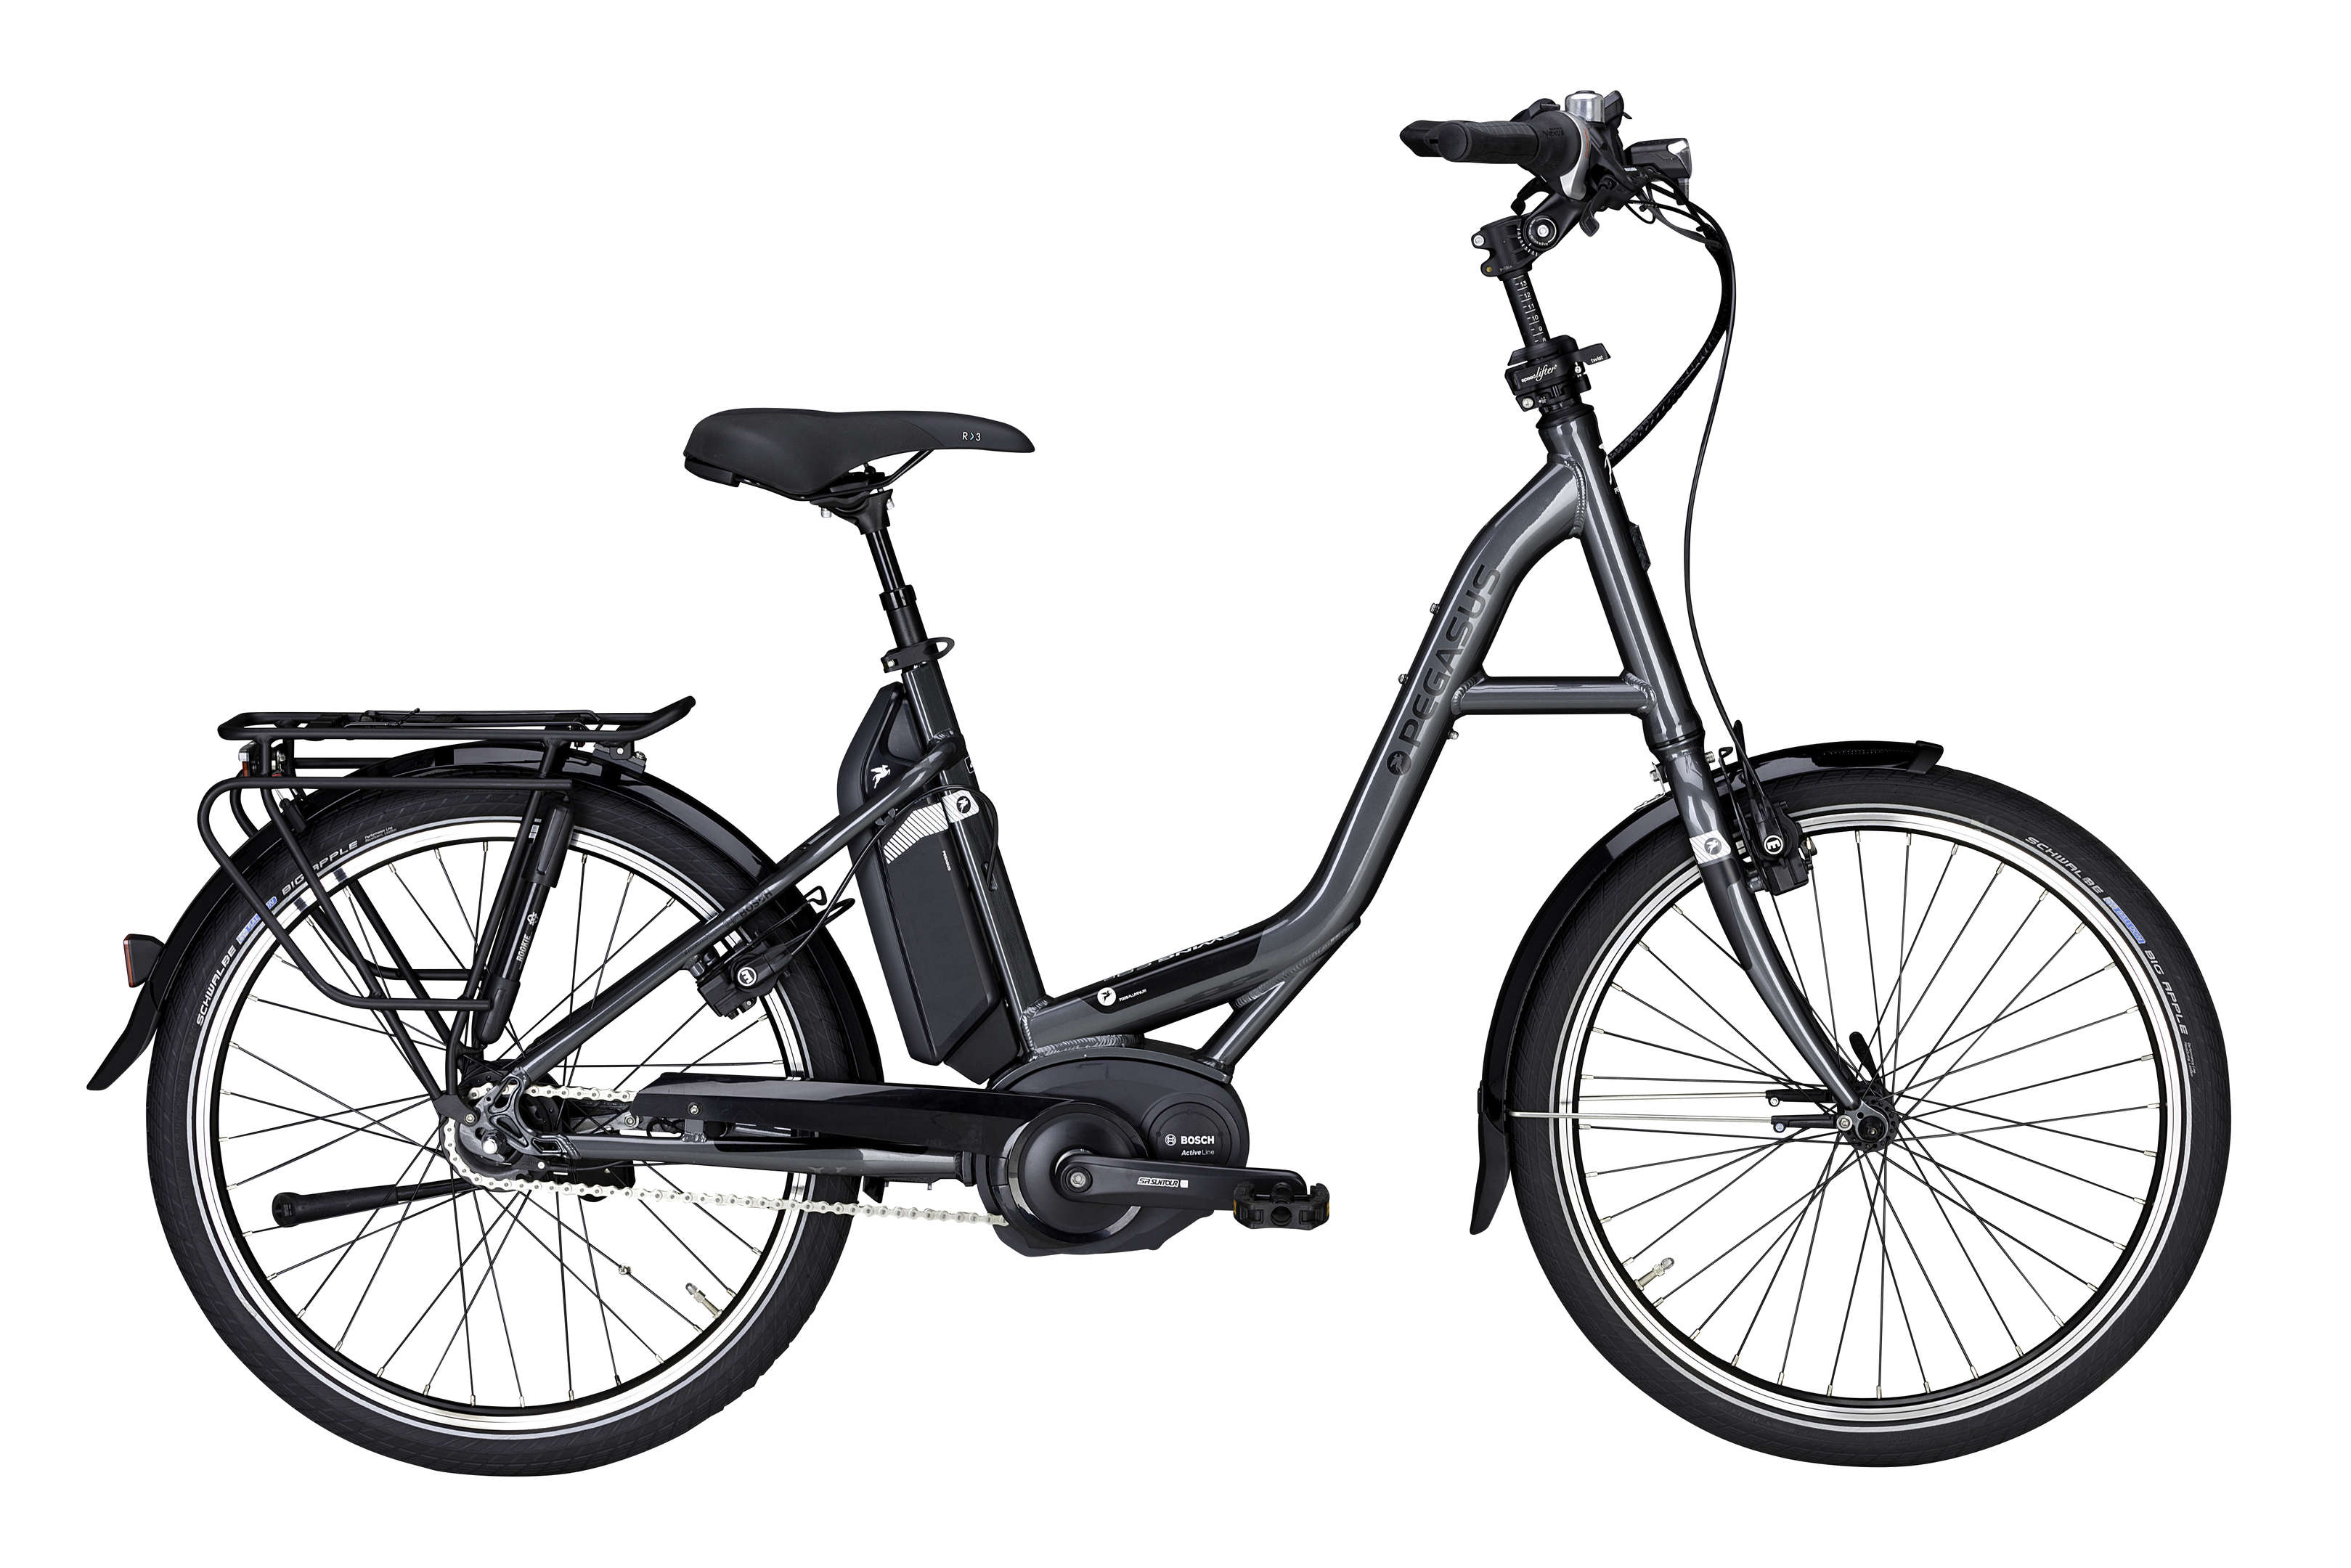 pegasus e bike swing e8r 24 eurorad bikeleasingeurorad. Black Bedroom Furniture Sets. Home Design Ideas